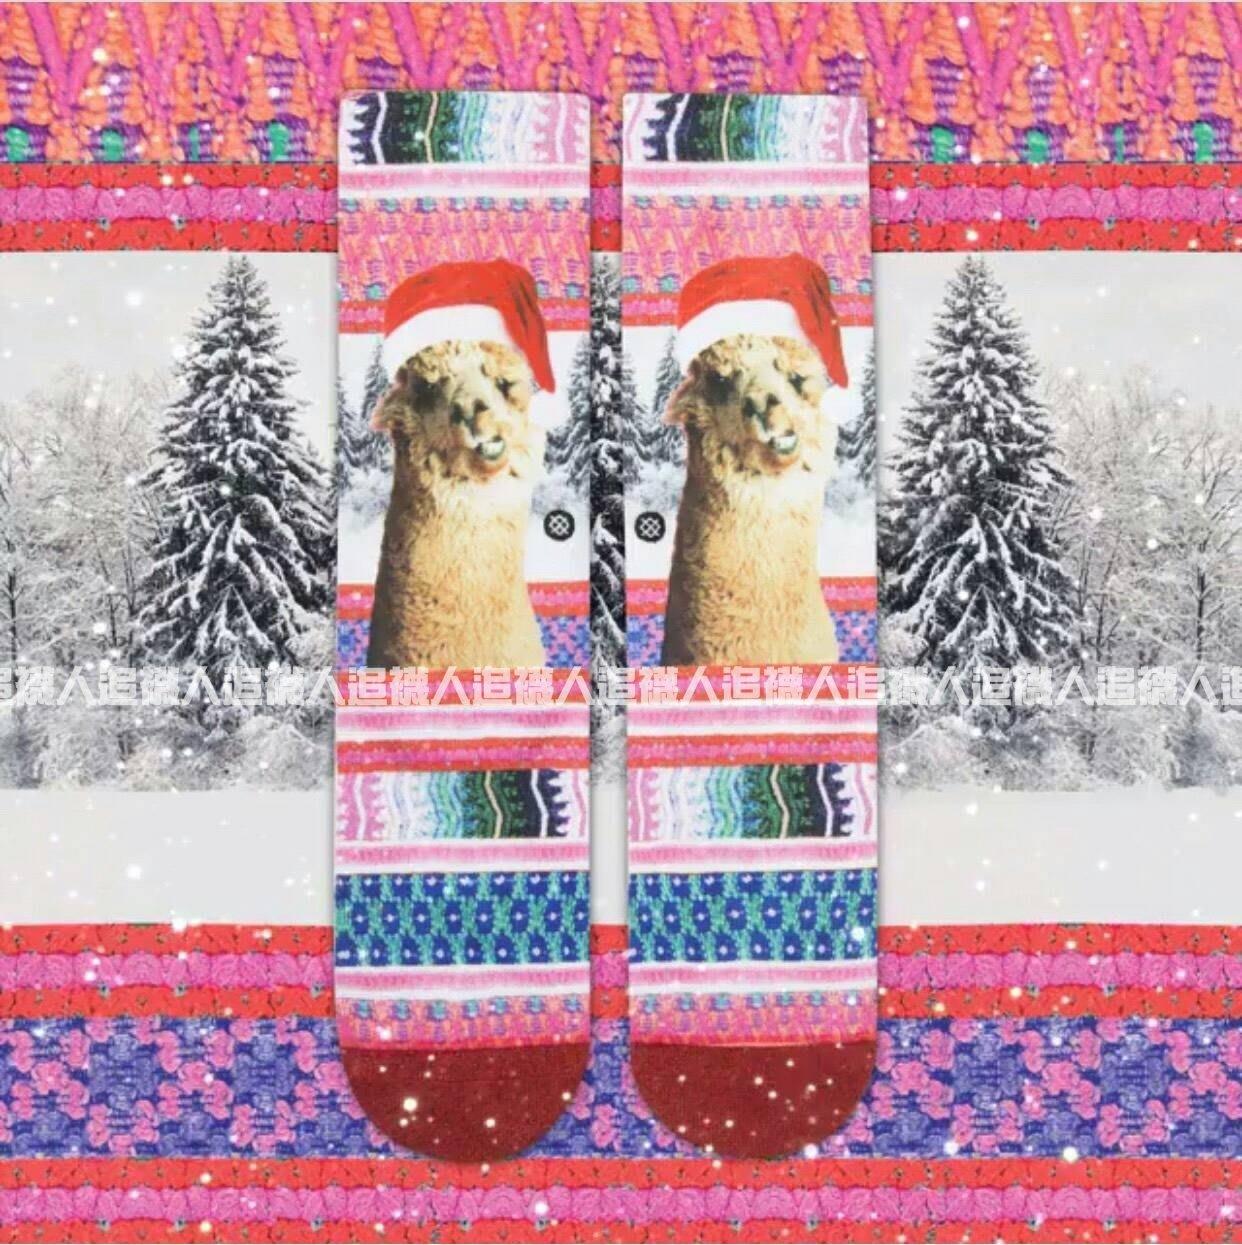 Stance 聖誕限定款 TINSEL TINA  襪子 羊駝 草泥馬 中筒襪 女生專屬 S號 粉色亮眼 節慶款式